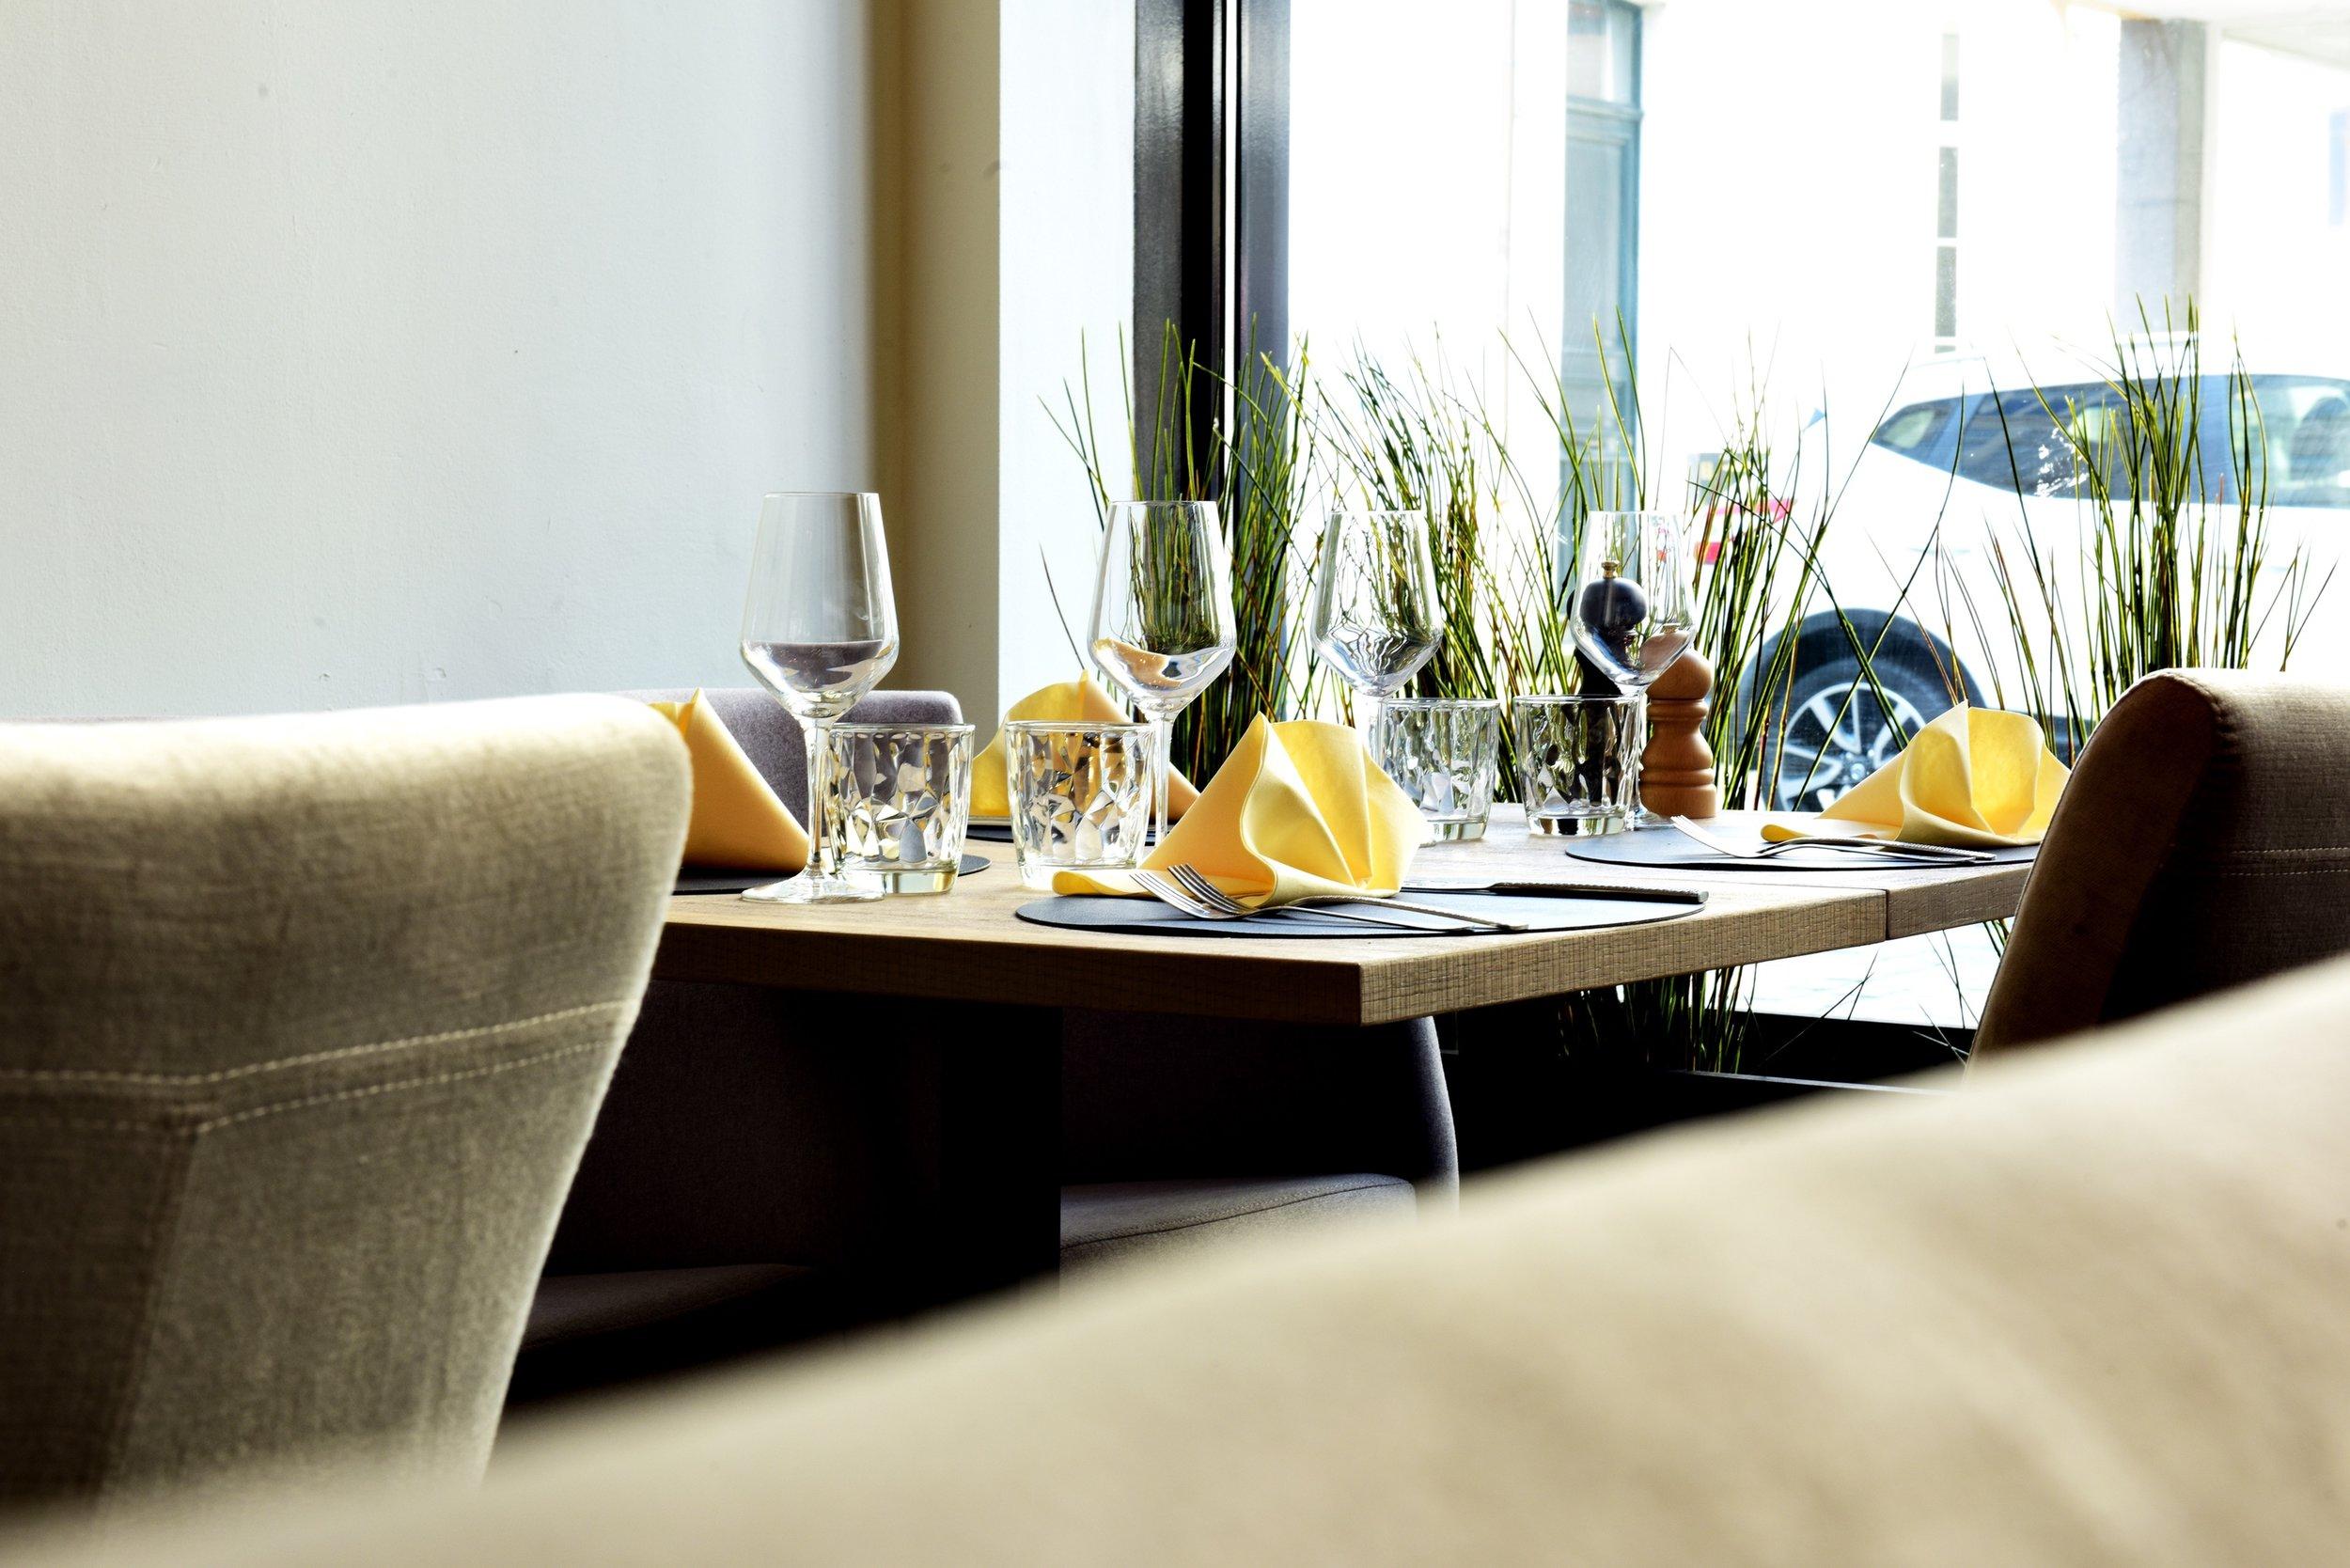 13 italiaans restaurant gent l incontro lincontro.jpg.jpg.jpg.jpg.jpg.jpg